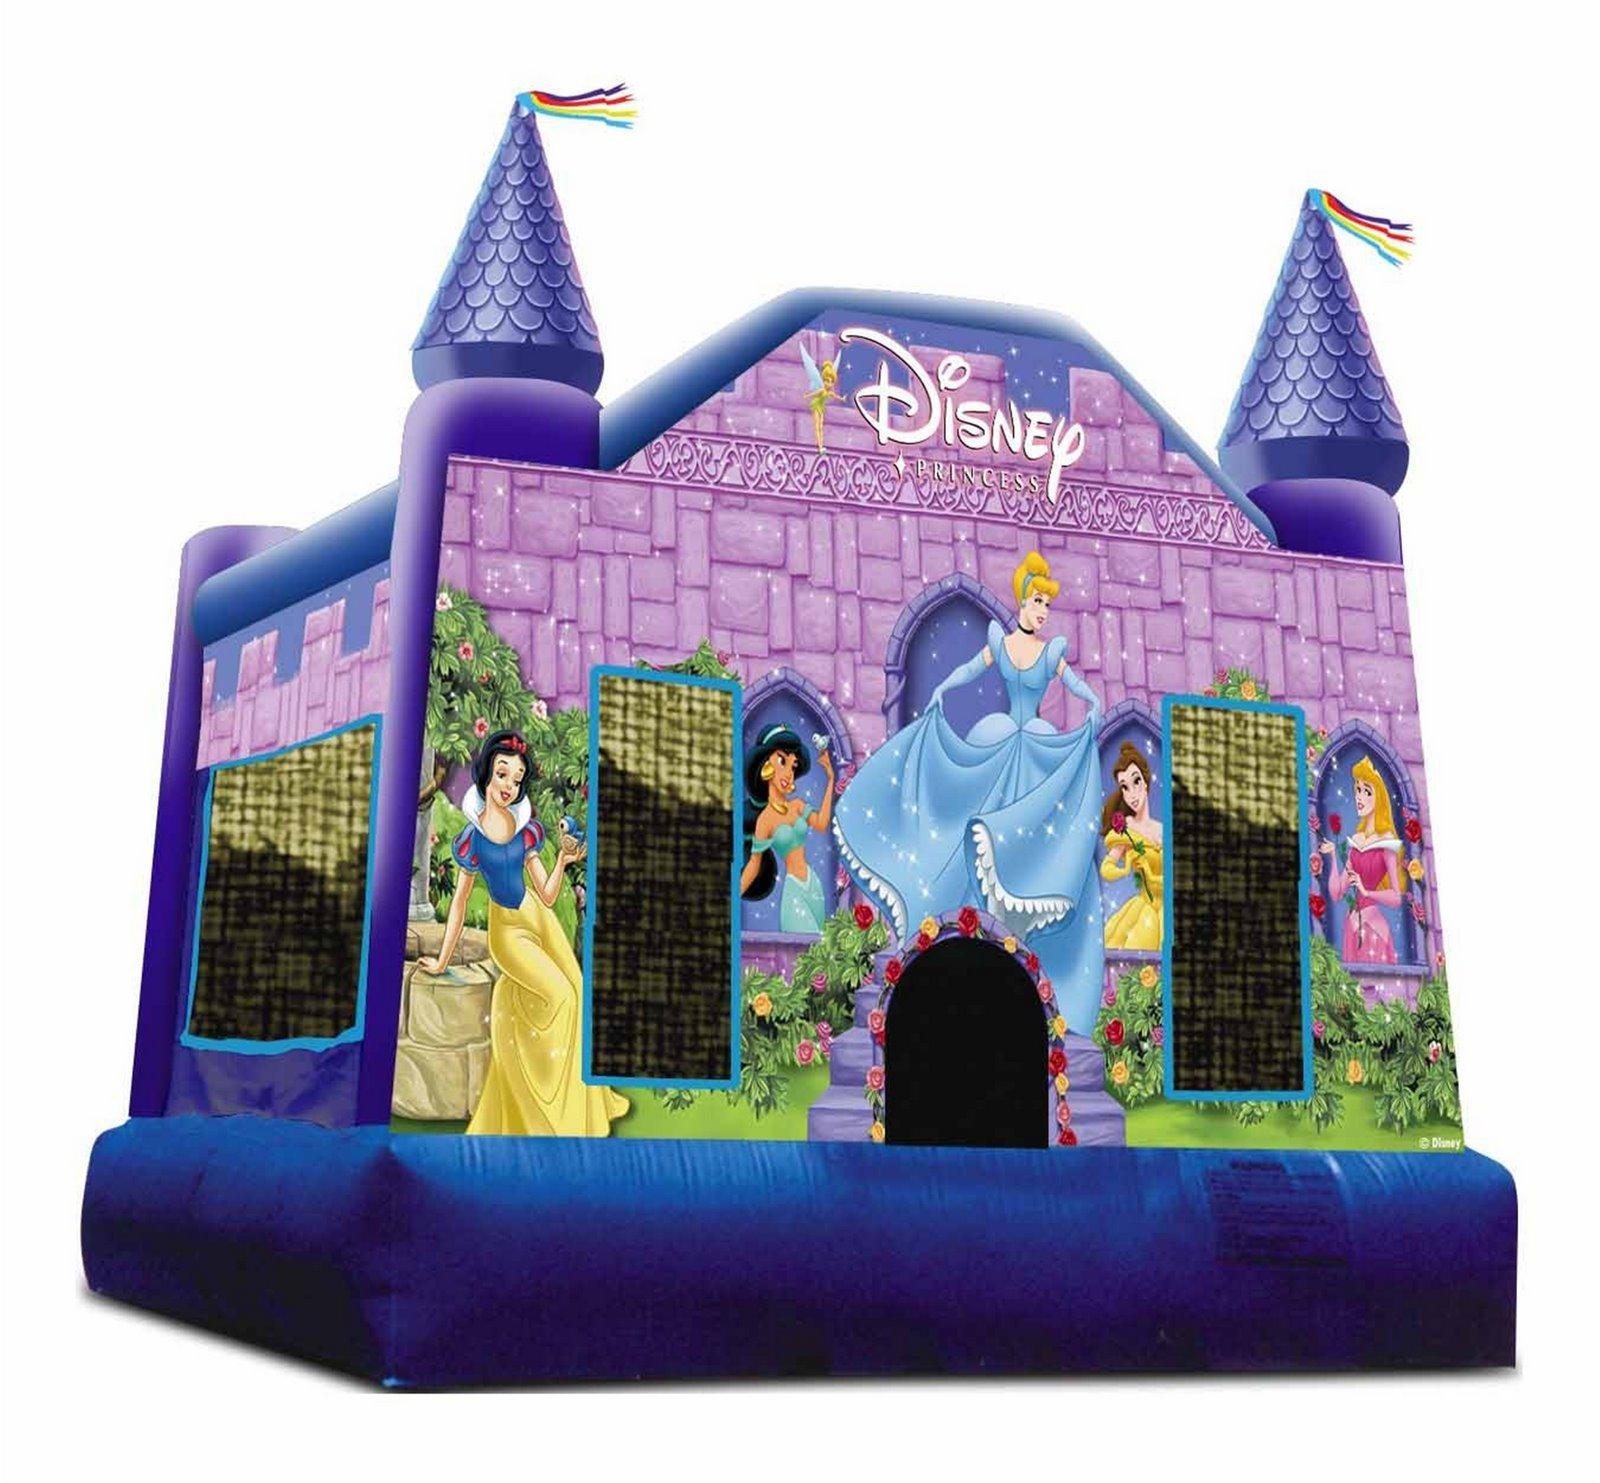 Splendid Disney Princess Castle Nj Horizon Entertainment Disney Princess Castle Experience Disney Princess Castle Dollhouse inspiration Disney Princess Castle